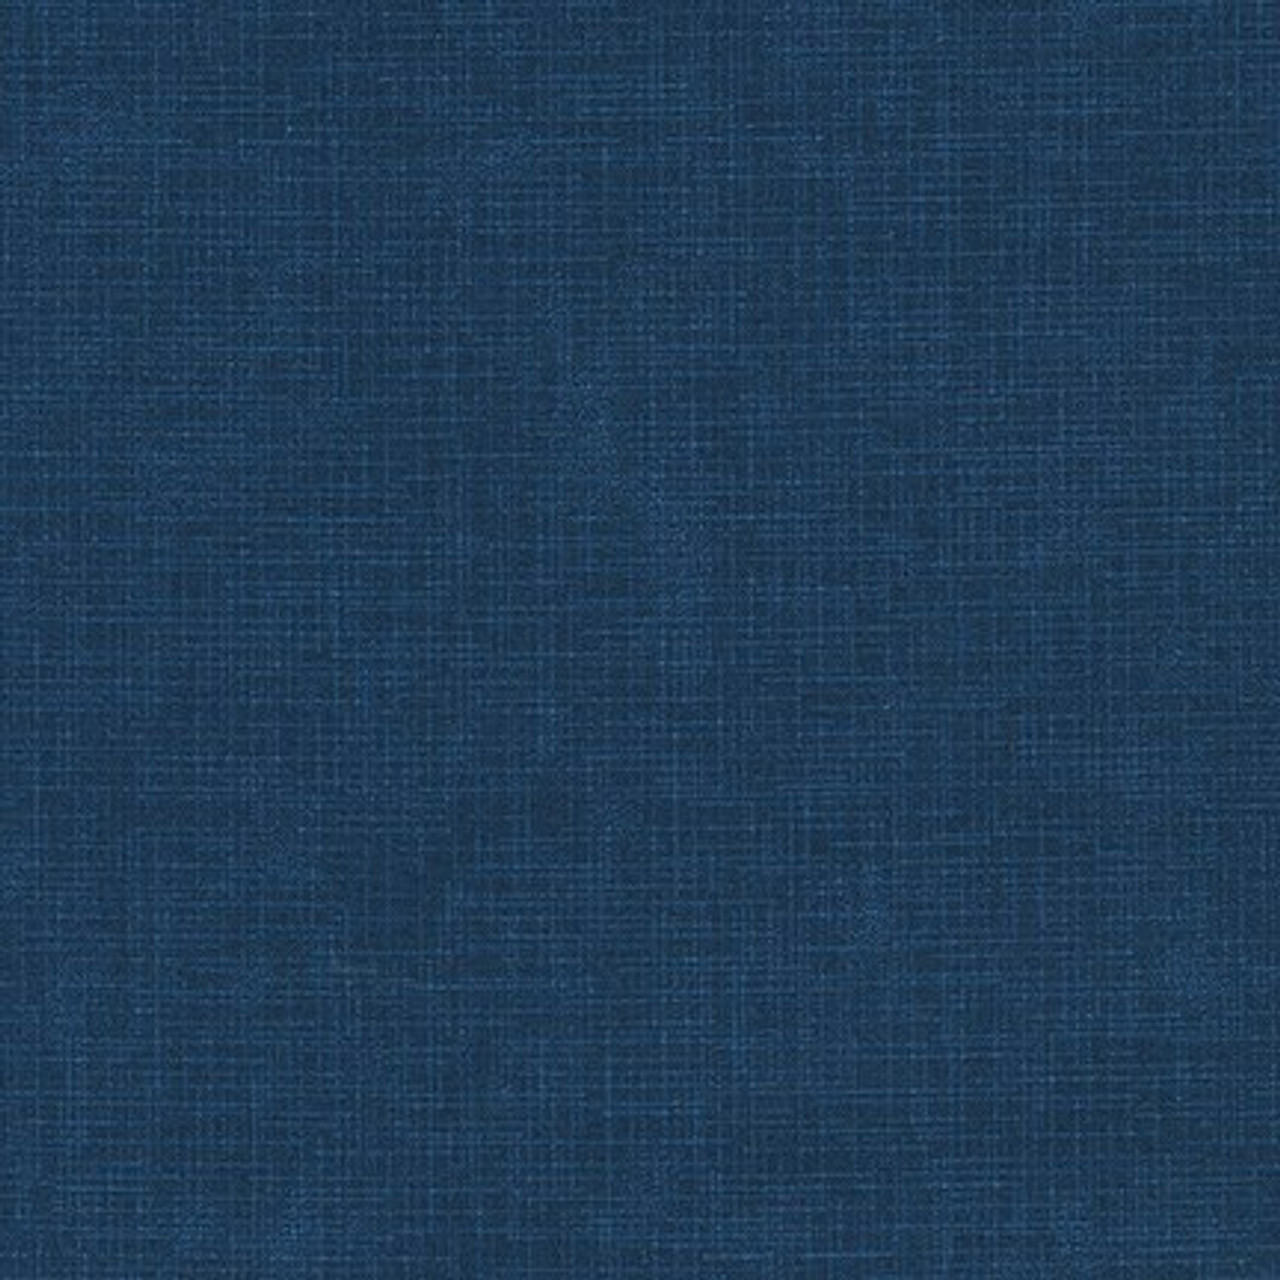 100% Cotton linen look - Teal